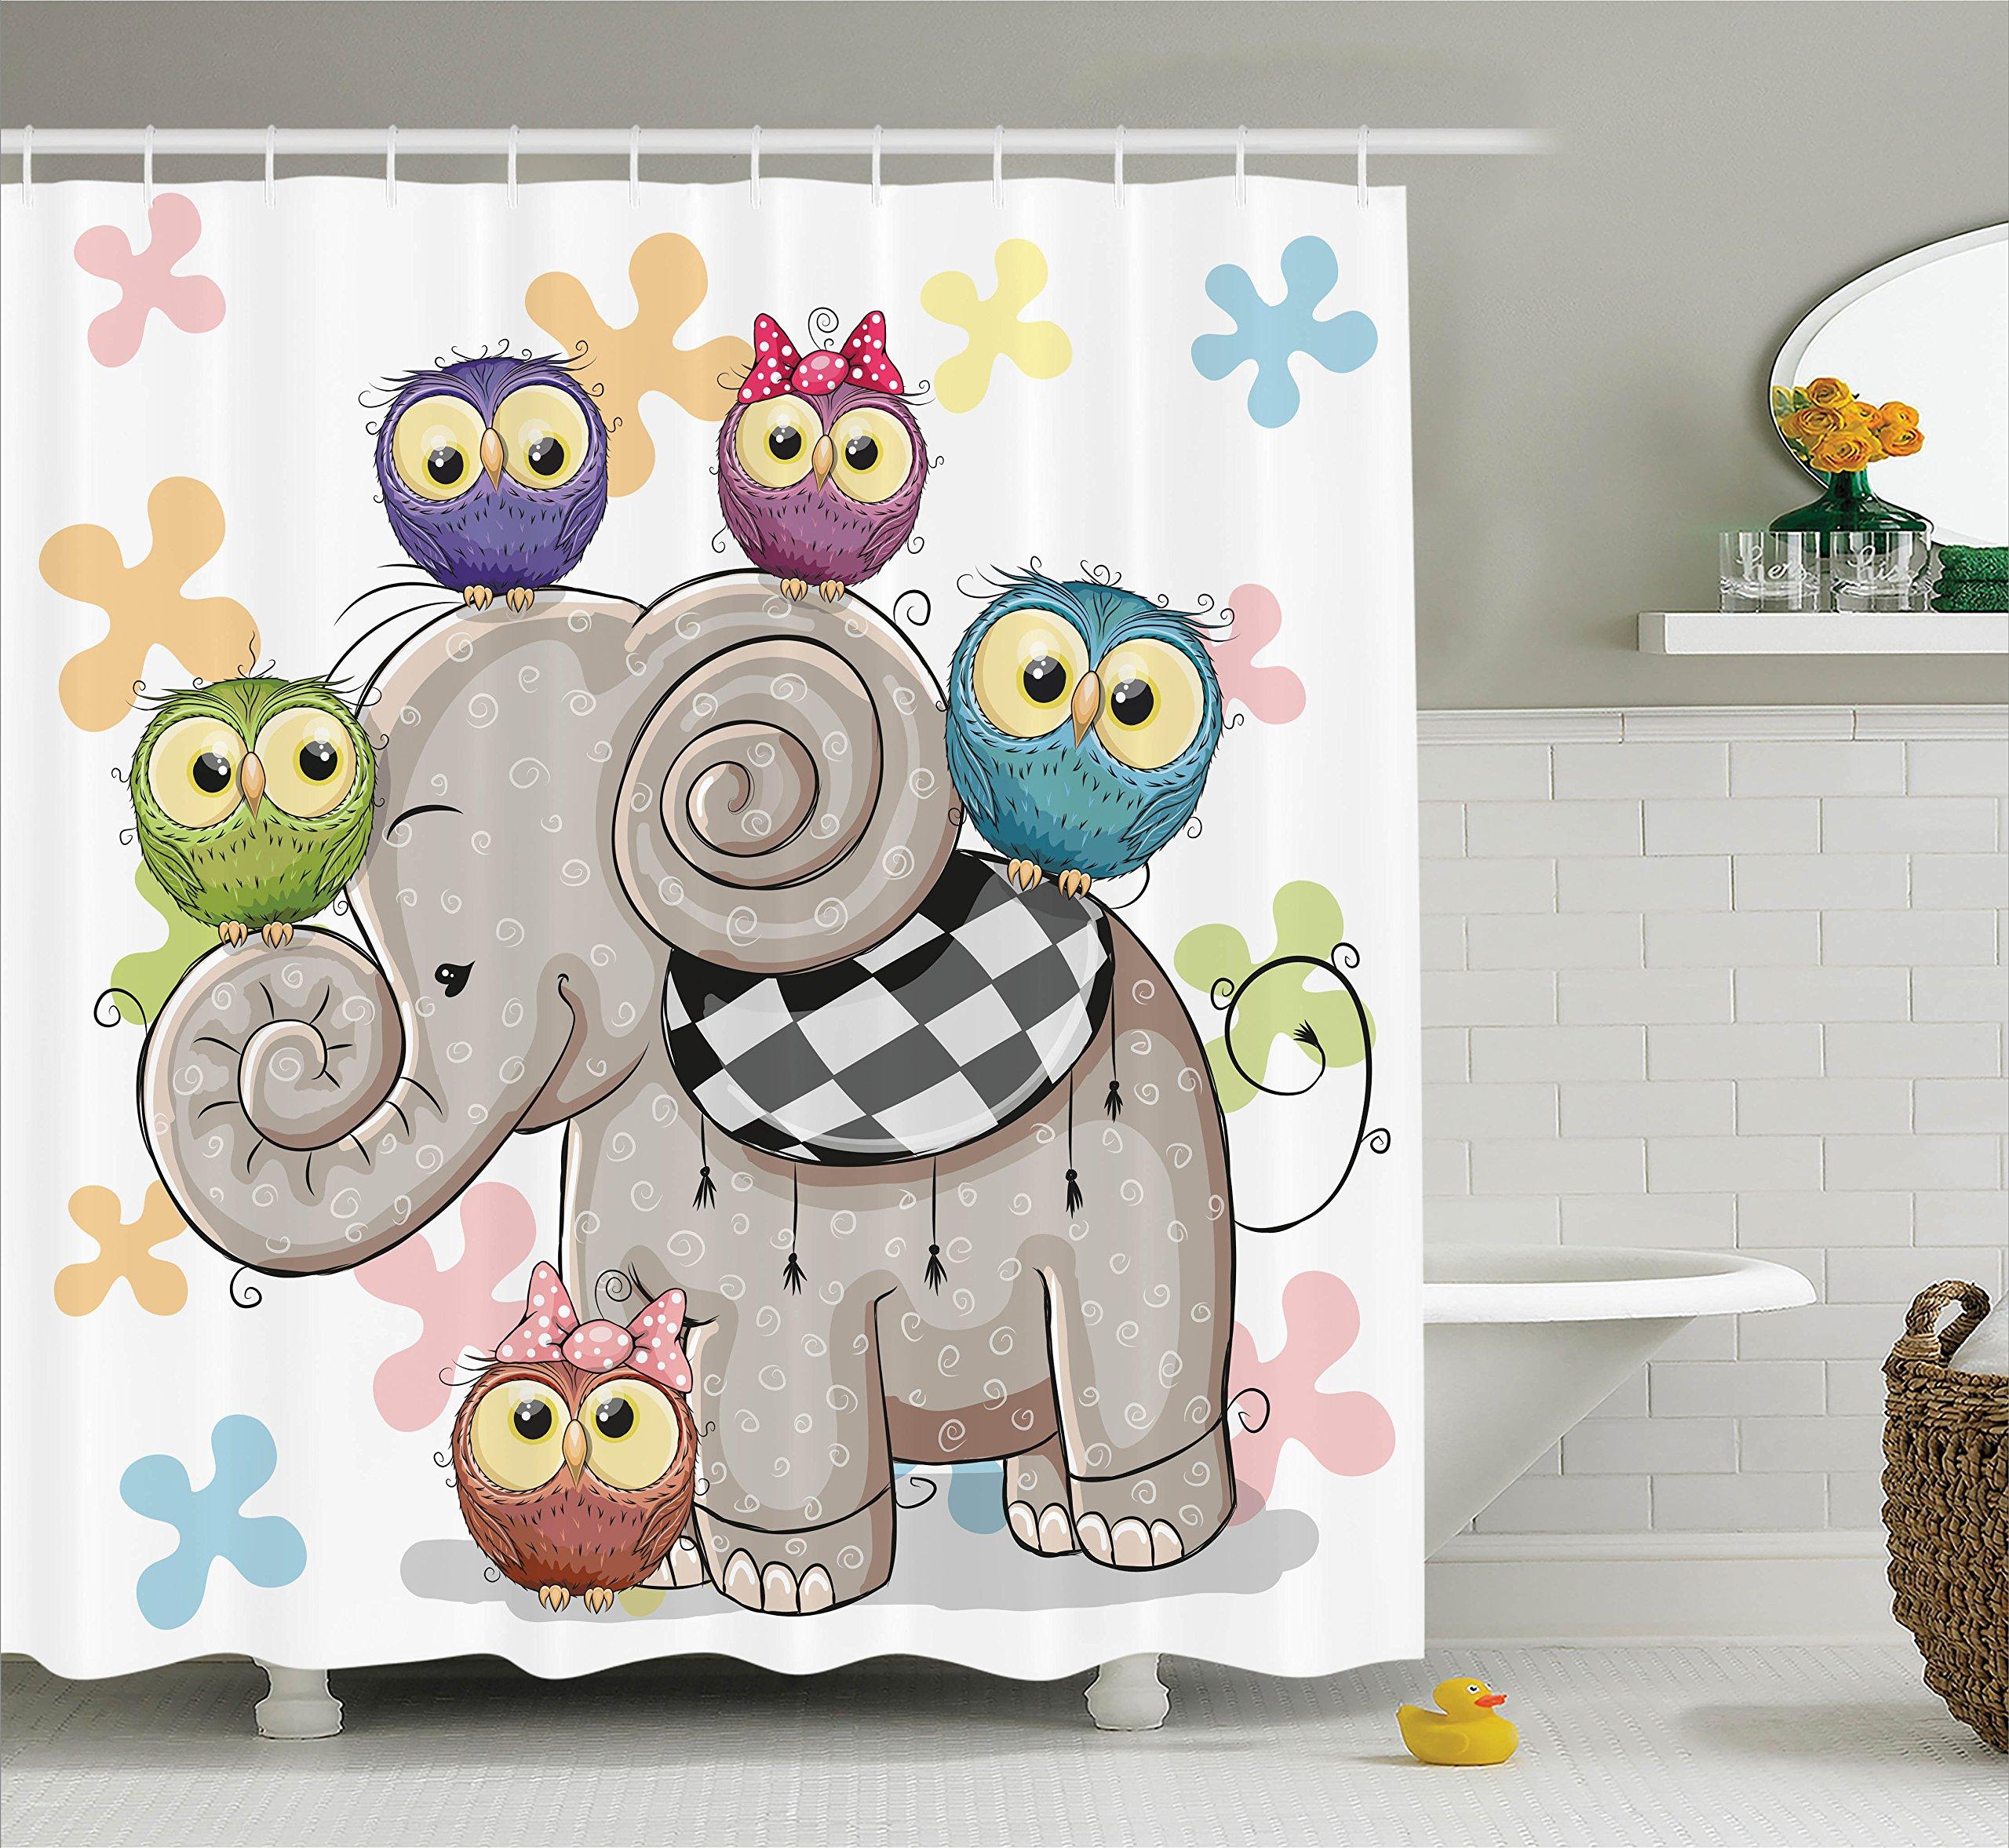 Ambesonne Cartoon Decor Shower Curtain Set by, Cute Cartoon Elephant and Owls On A Floral Background Animal Love Big Eyes Boys Girls Decor, Bathroom Accessories, 75 Inches Long, Multi